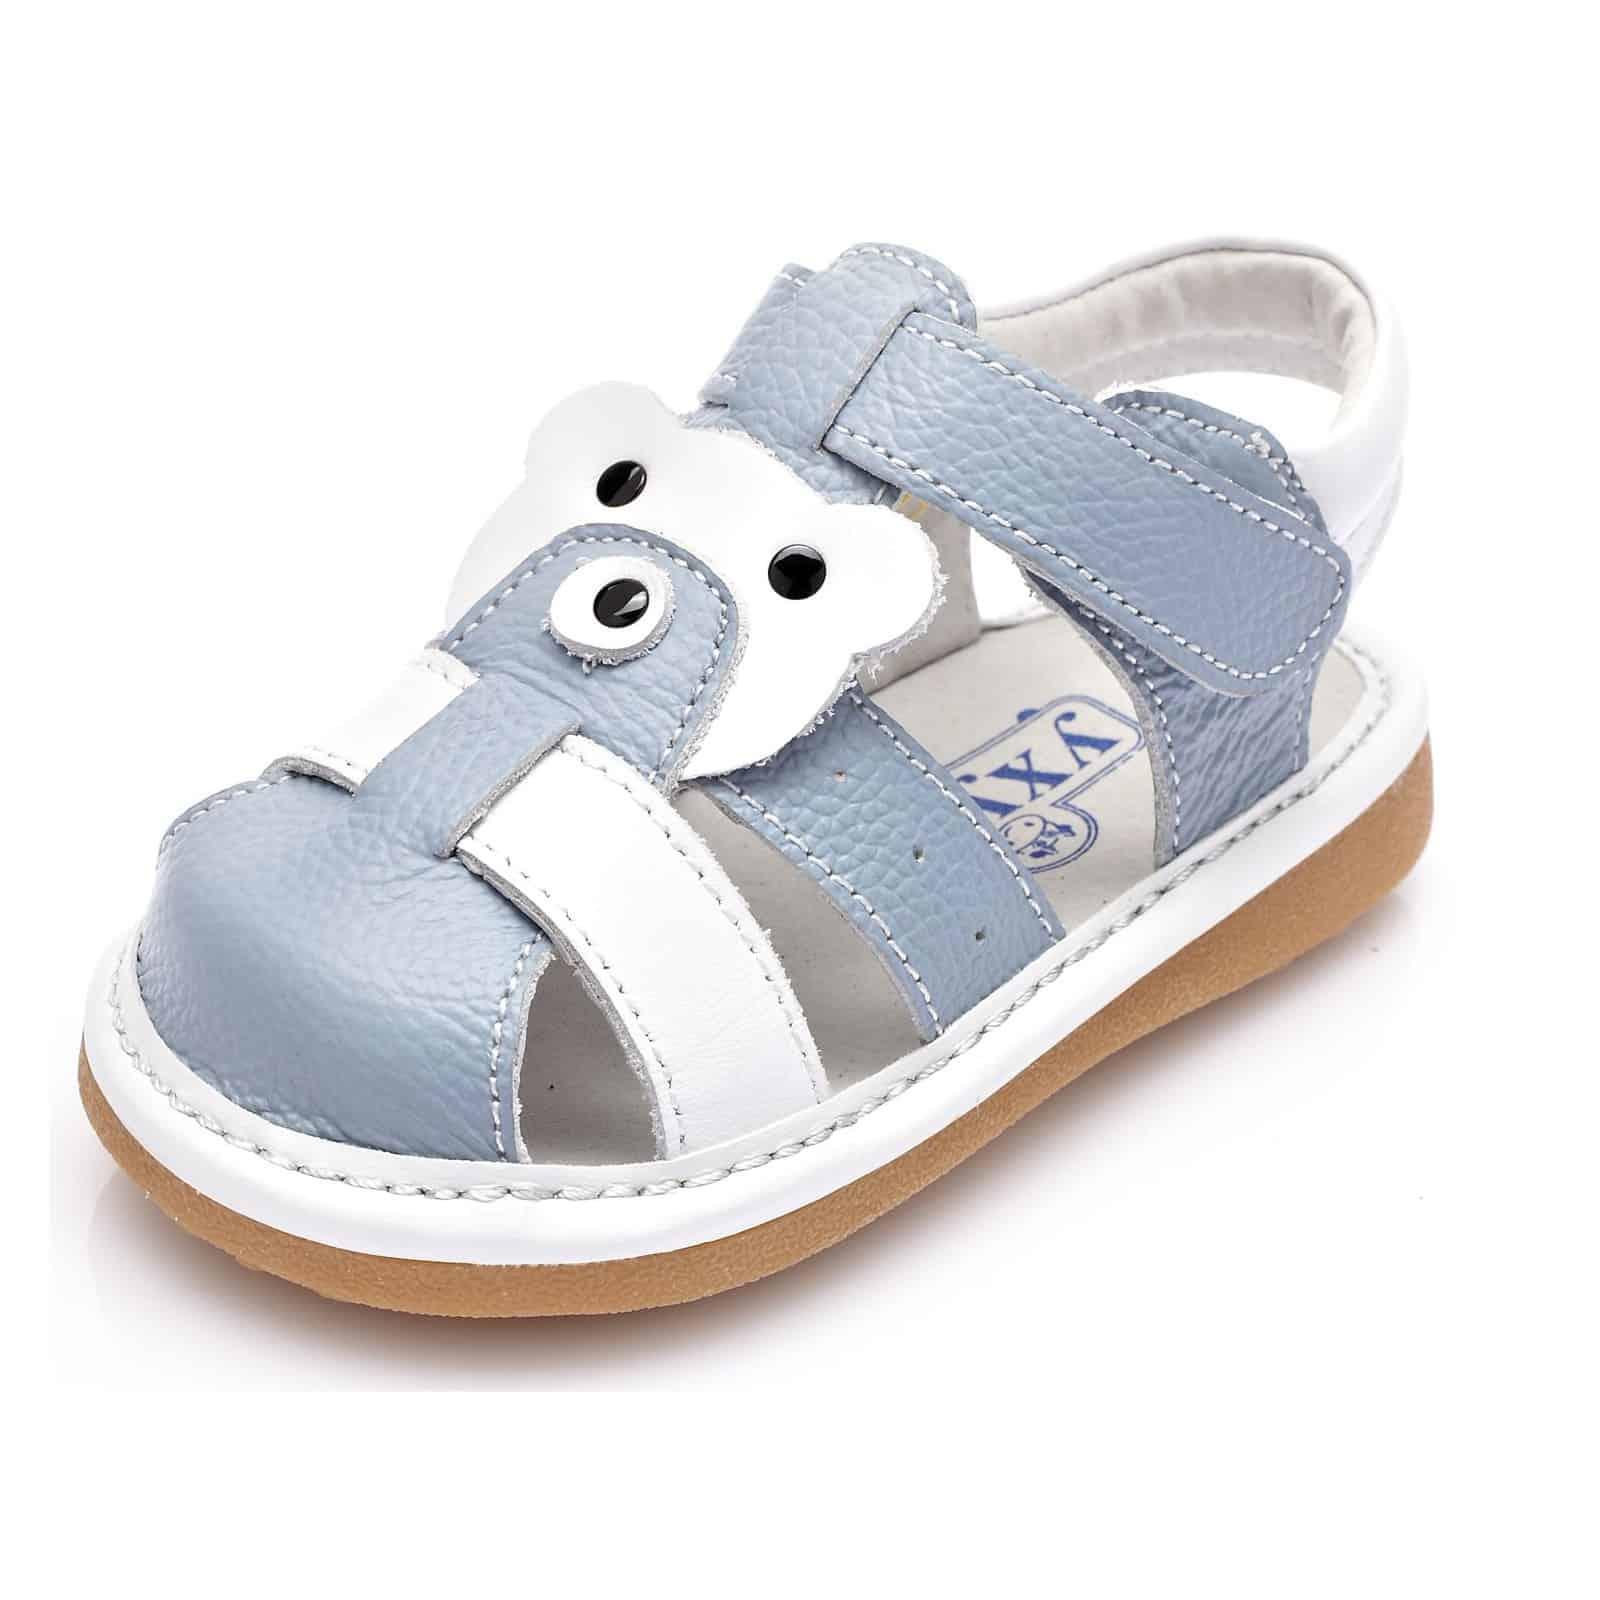 Little blu Lamb, Sandali bambine bianco bianco, bianco (bianco), 23